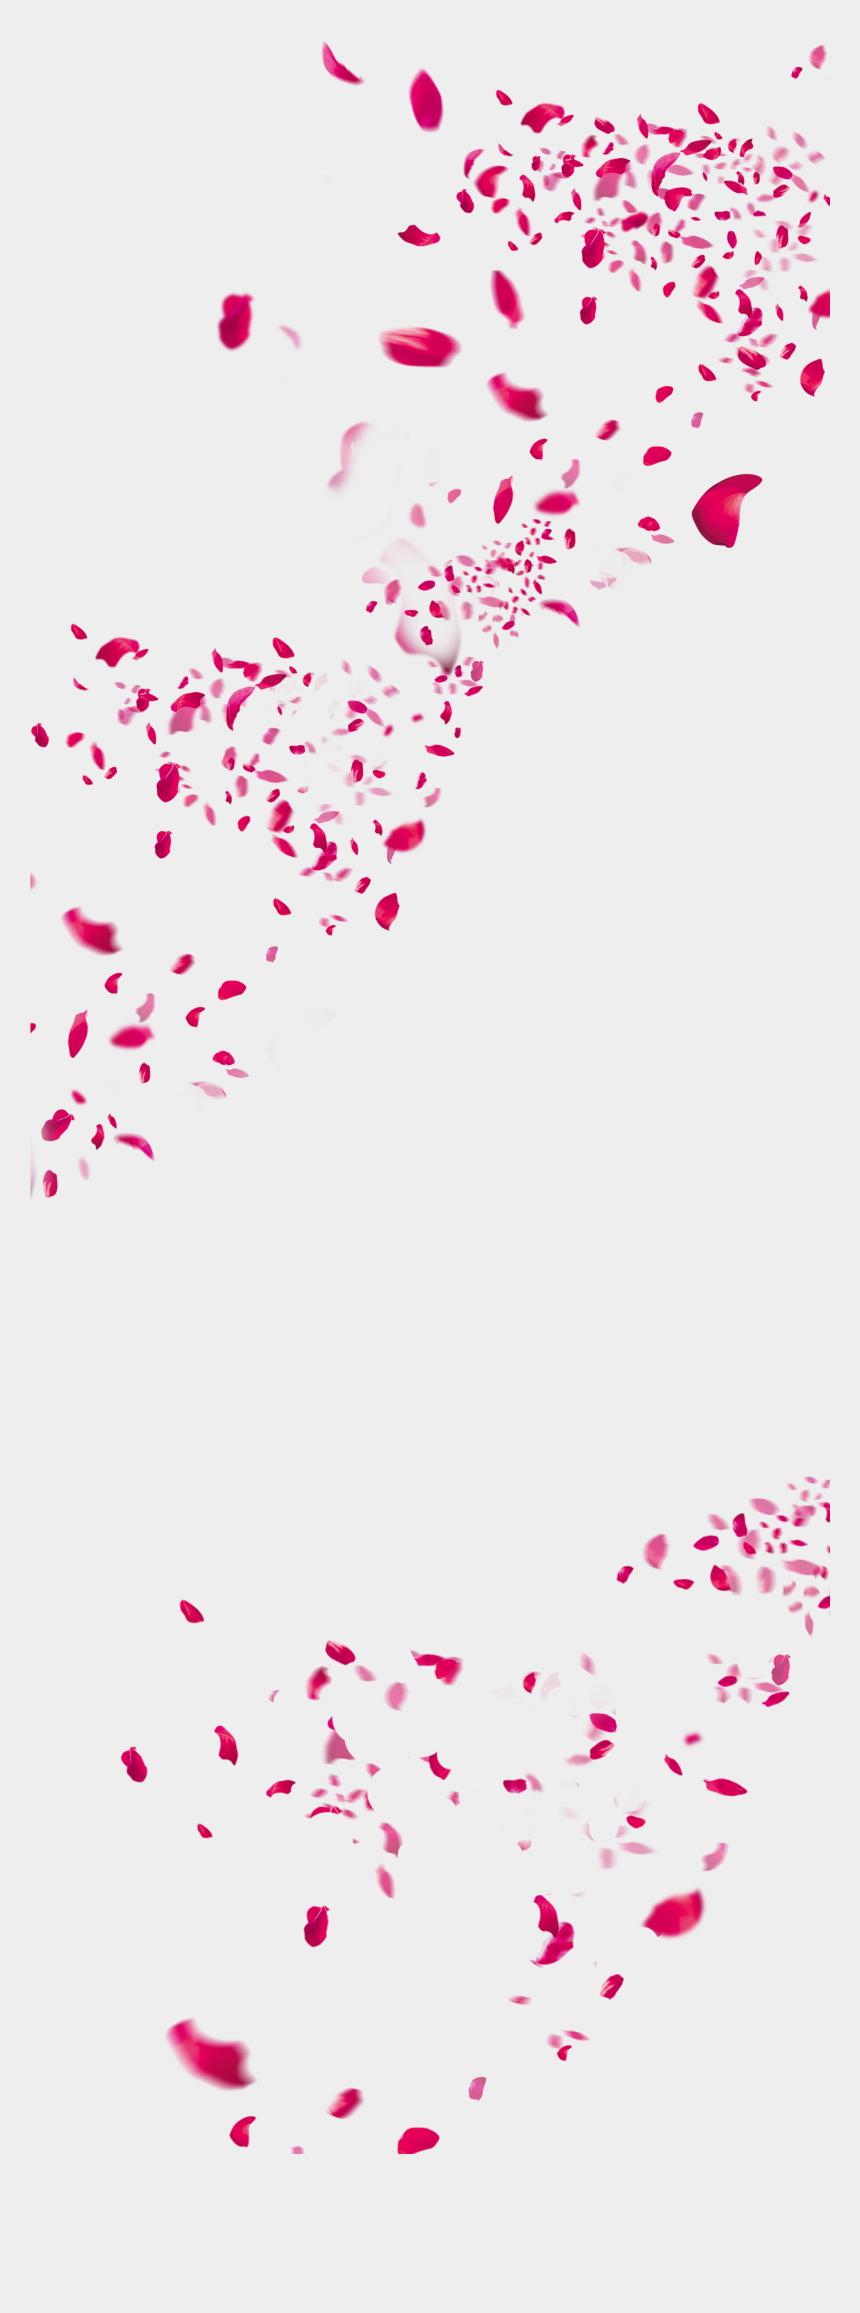 fall flowers clipart, Cartoons - Flower Wedding,rose Peach Petal Petals,festival,flowers, - Falling Petals Watercolor Png